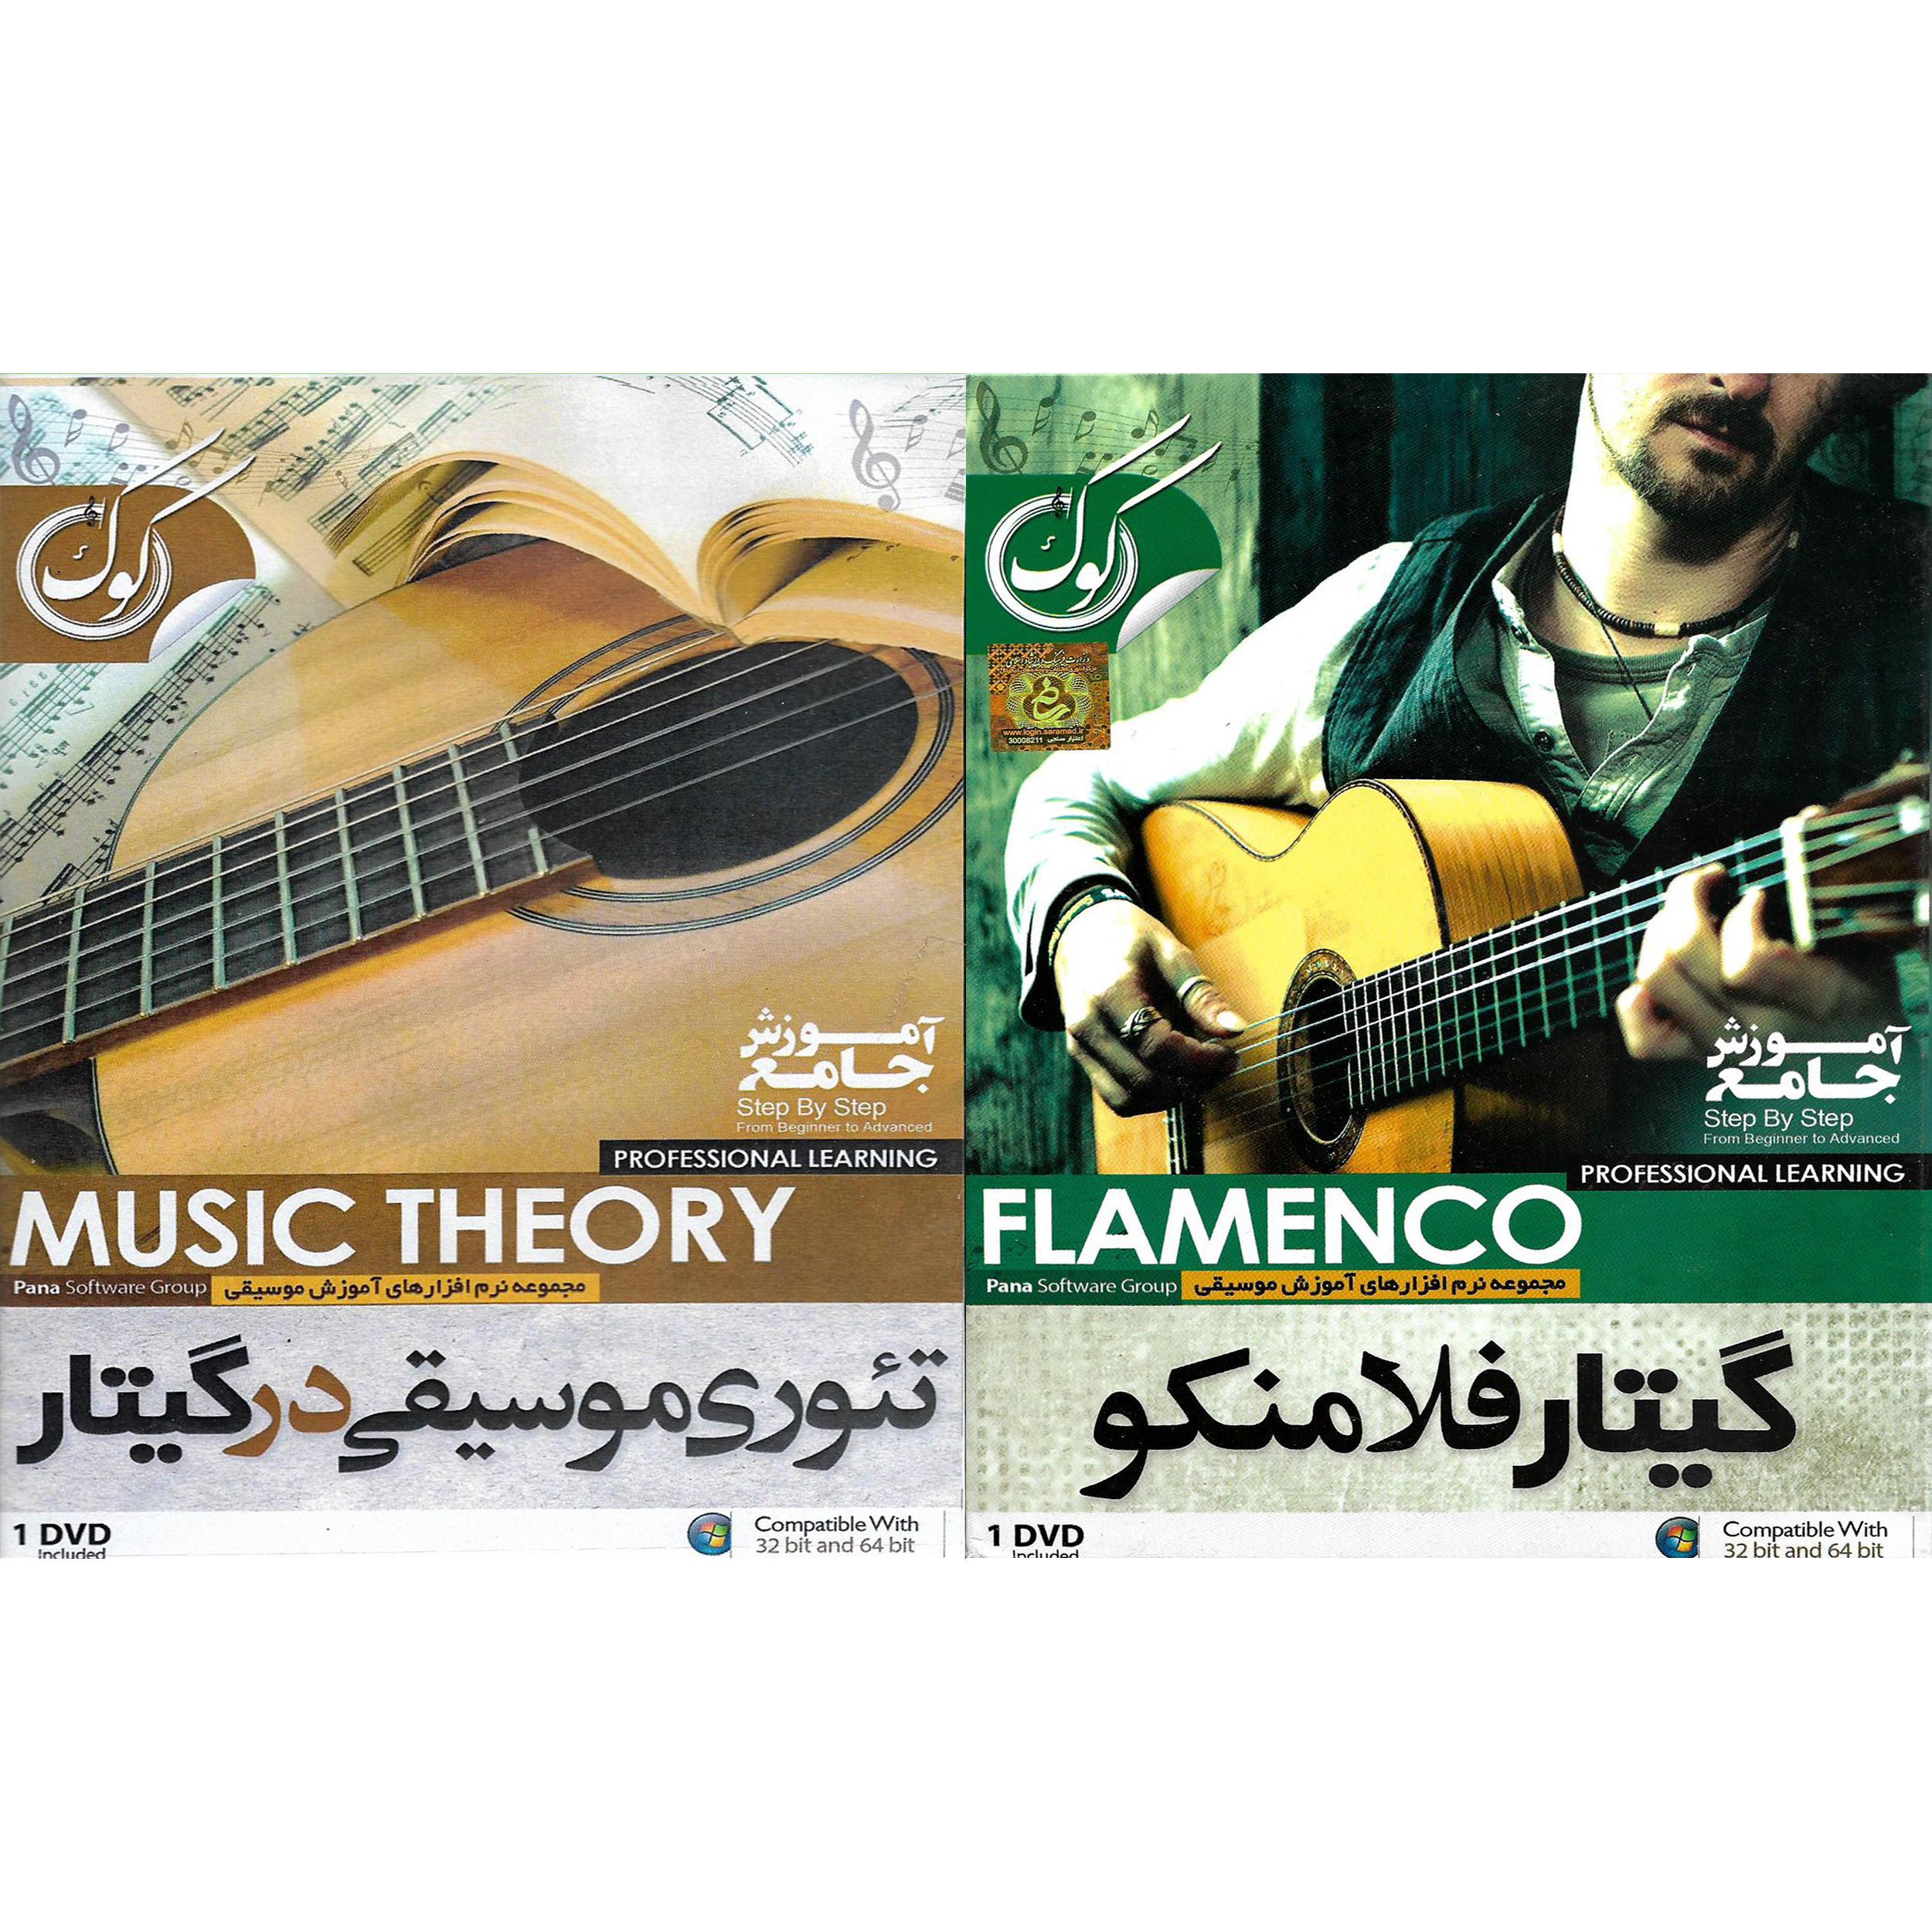 نرم افزار آموزشی تئوری موسیقی در گیتار نشر پاناپرداز به همراه نرم افزار آموزشی گیتار فلامنکو نشر پانا